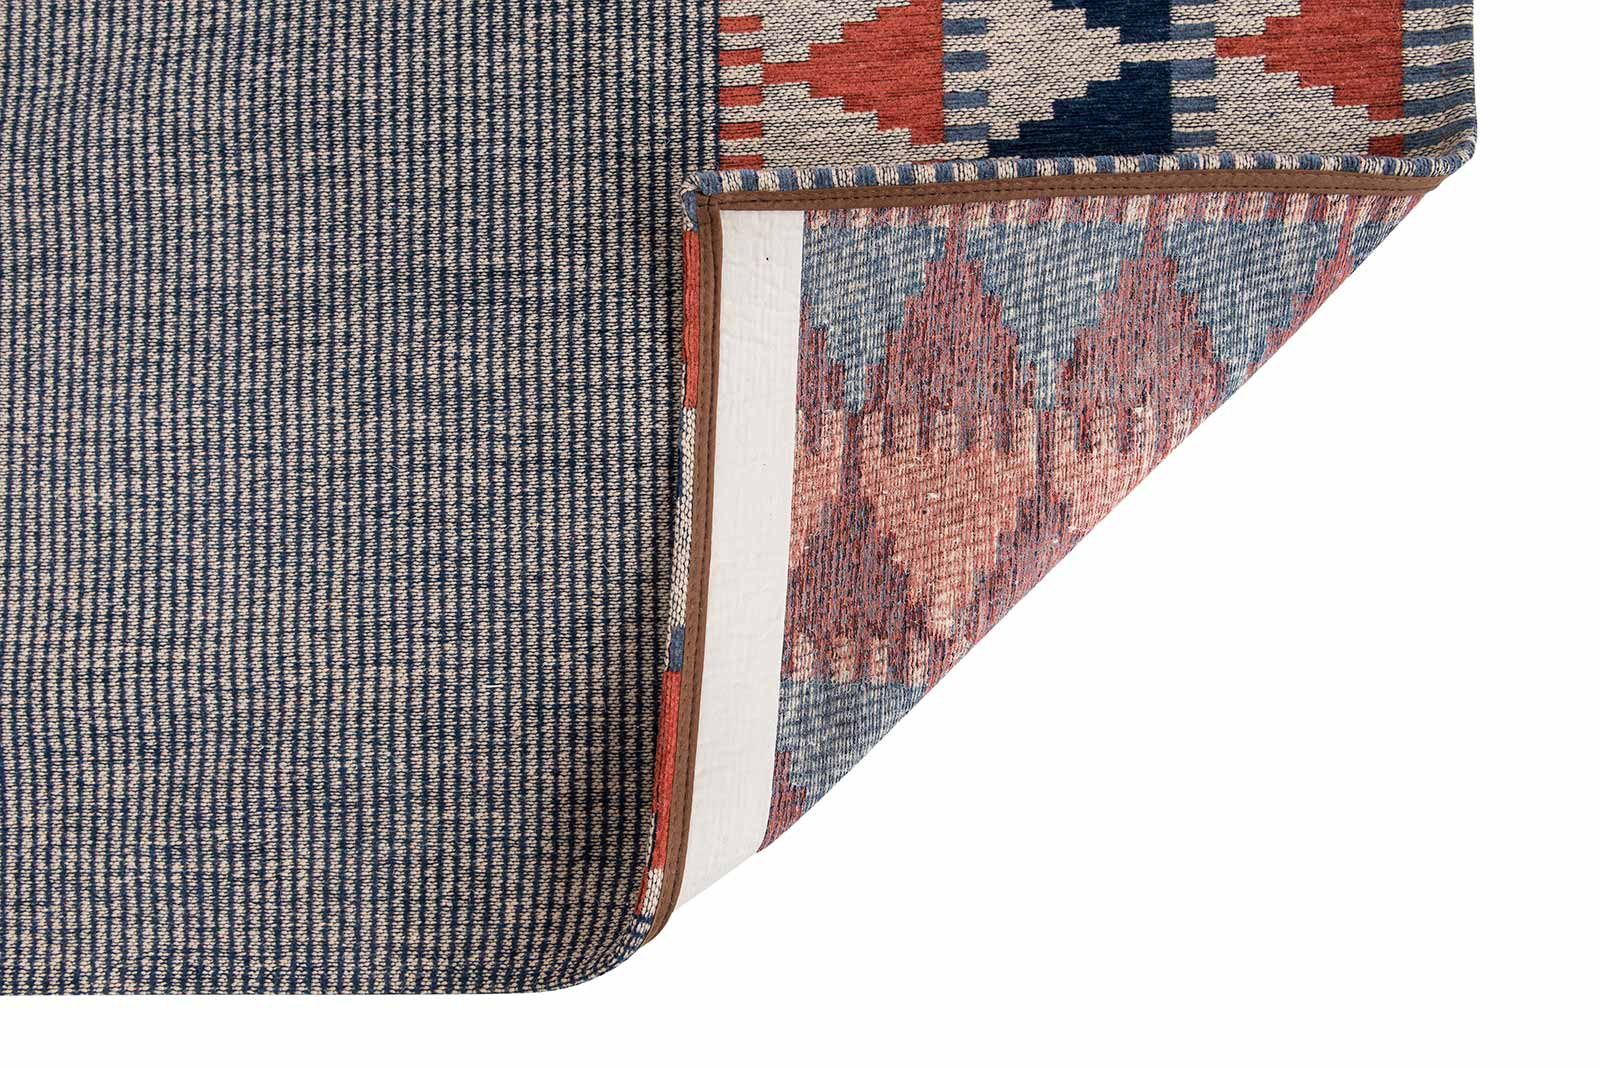 Louis De Poortere alfombras Villa Nova LX 8767 Tobi Indigo Tabasco back